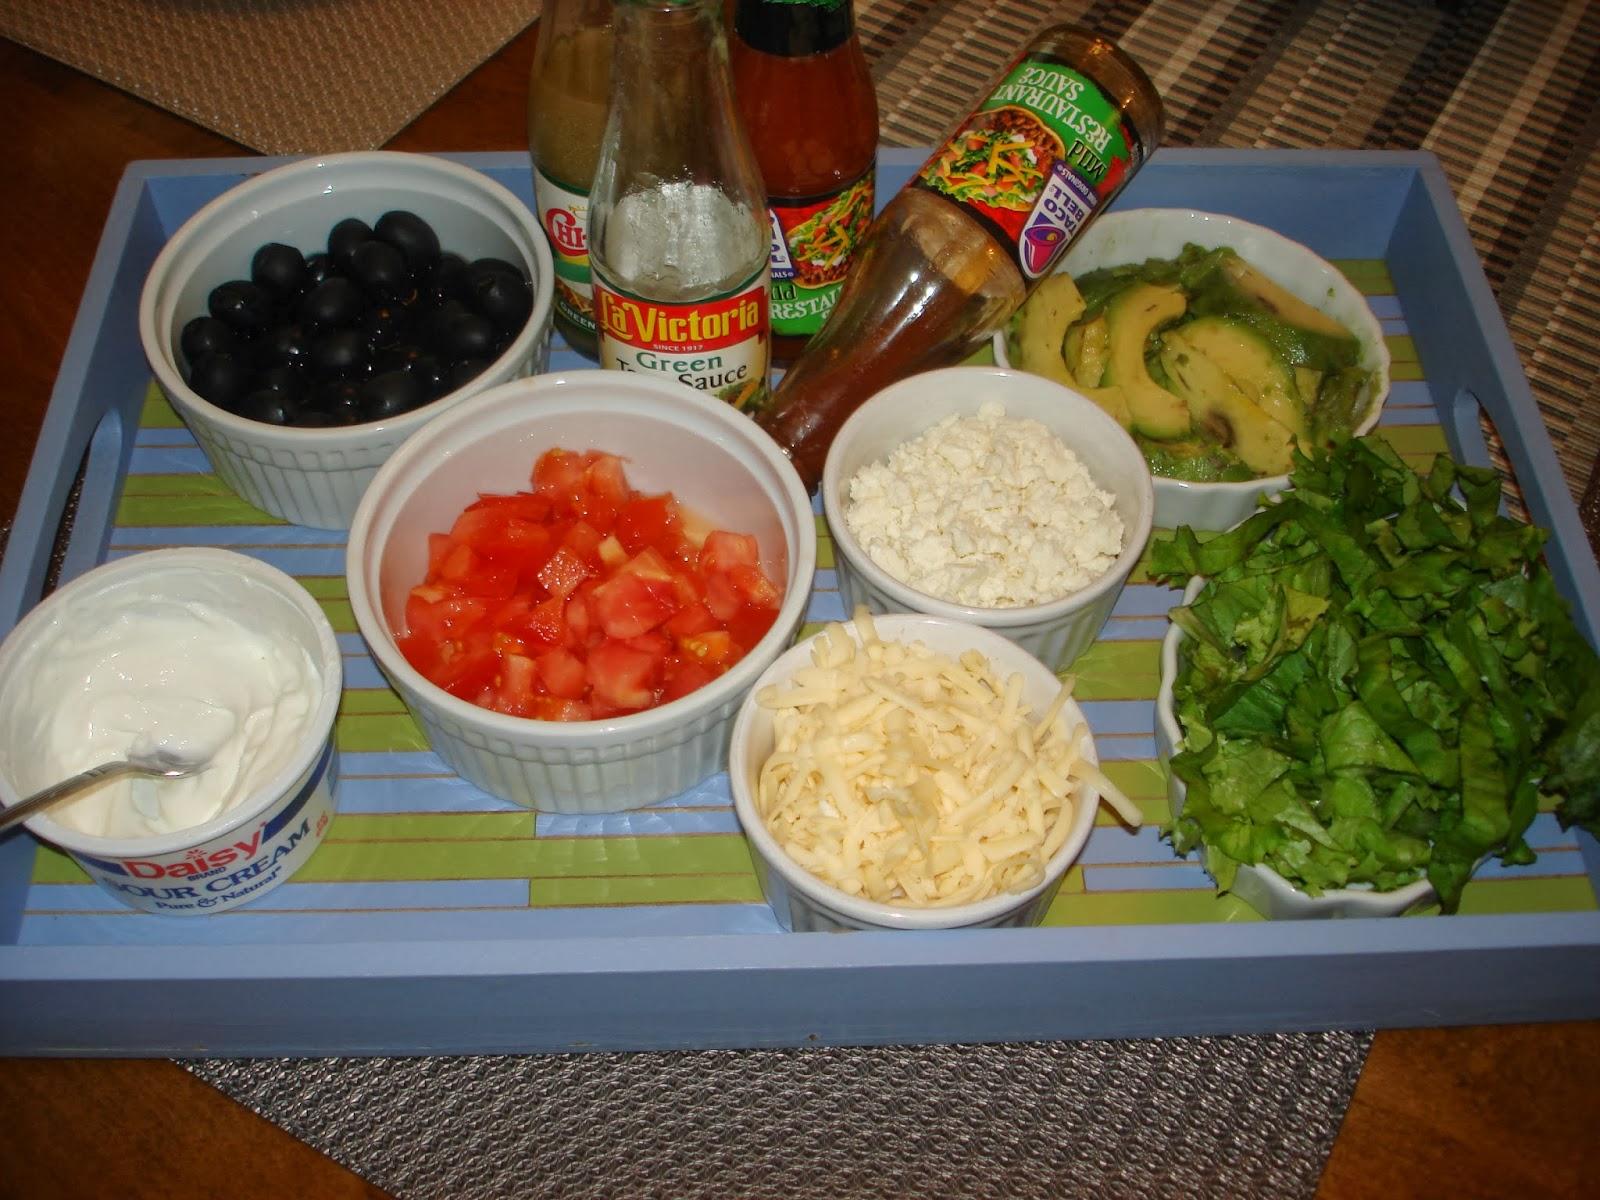 Kartoffelklösse Project: Superbowl Bar Food, Guacamole and...